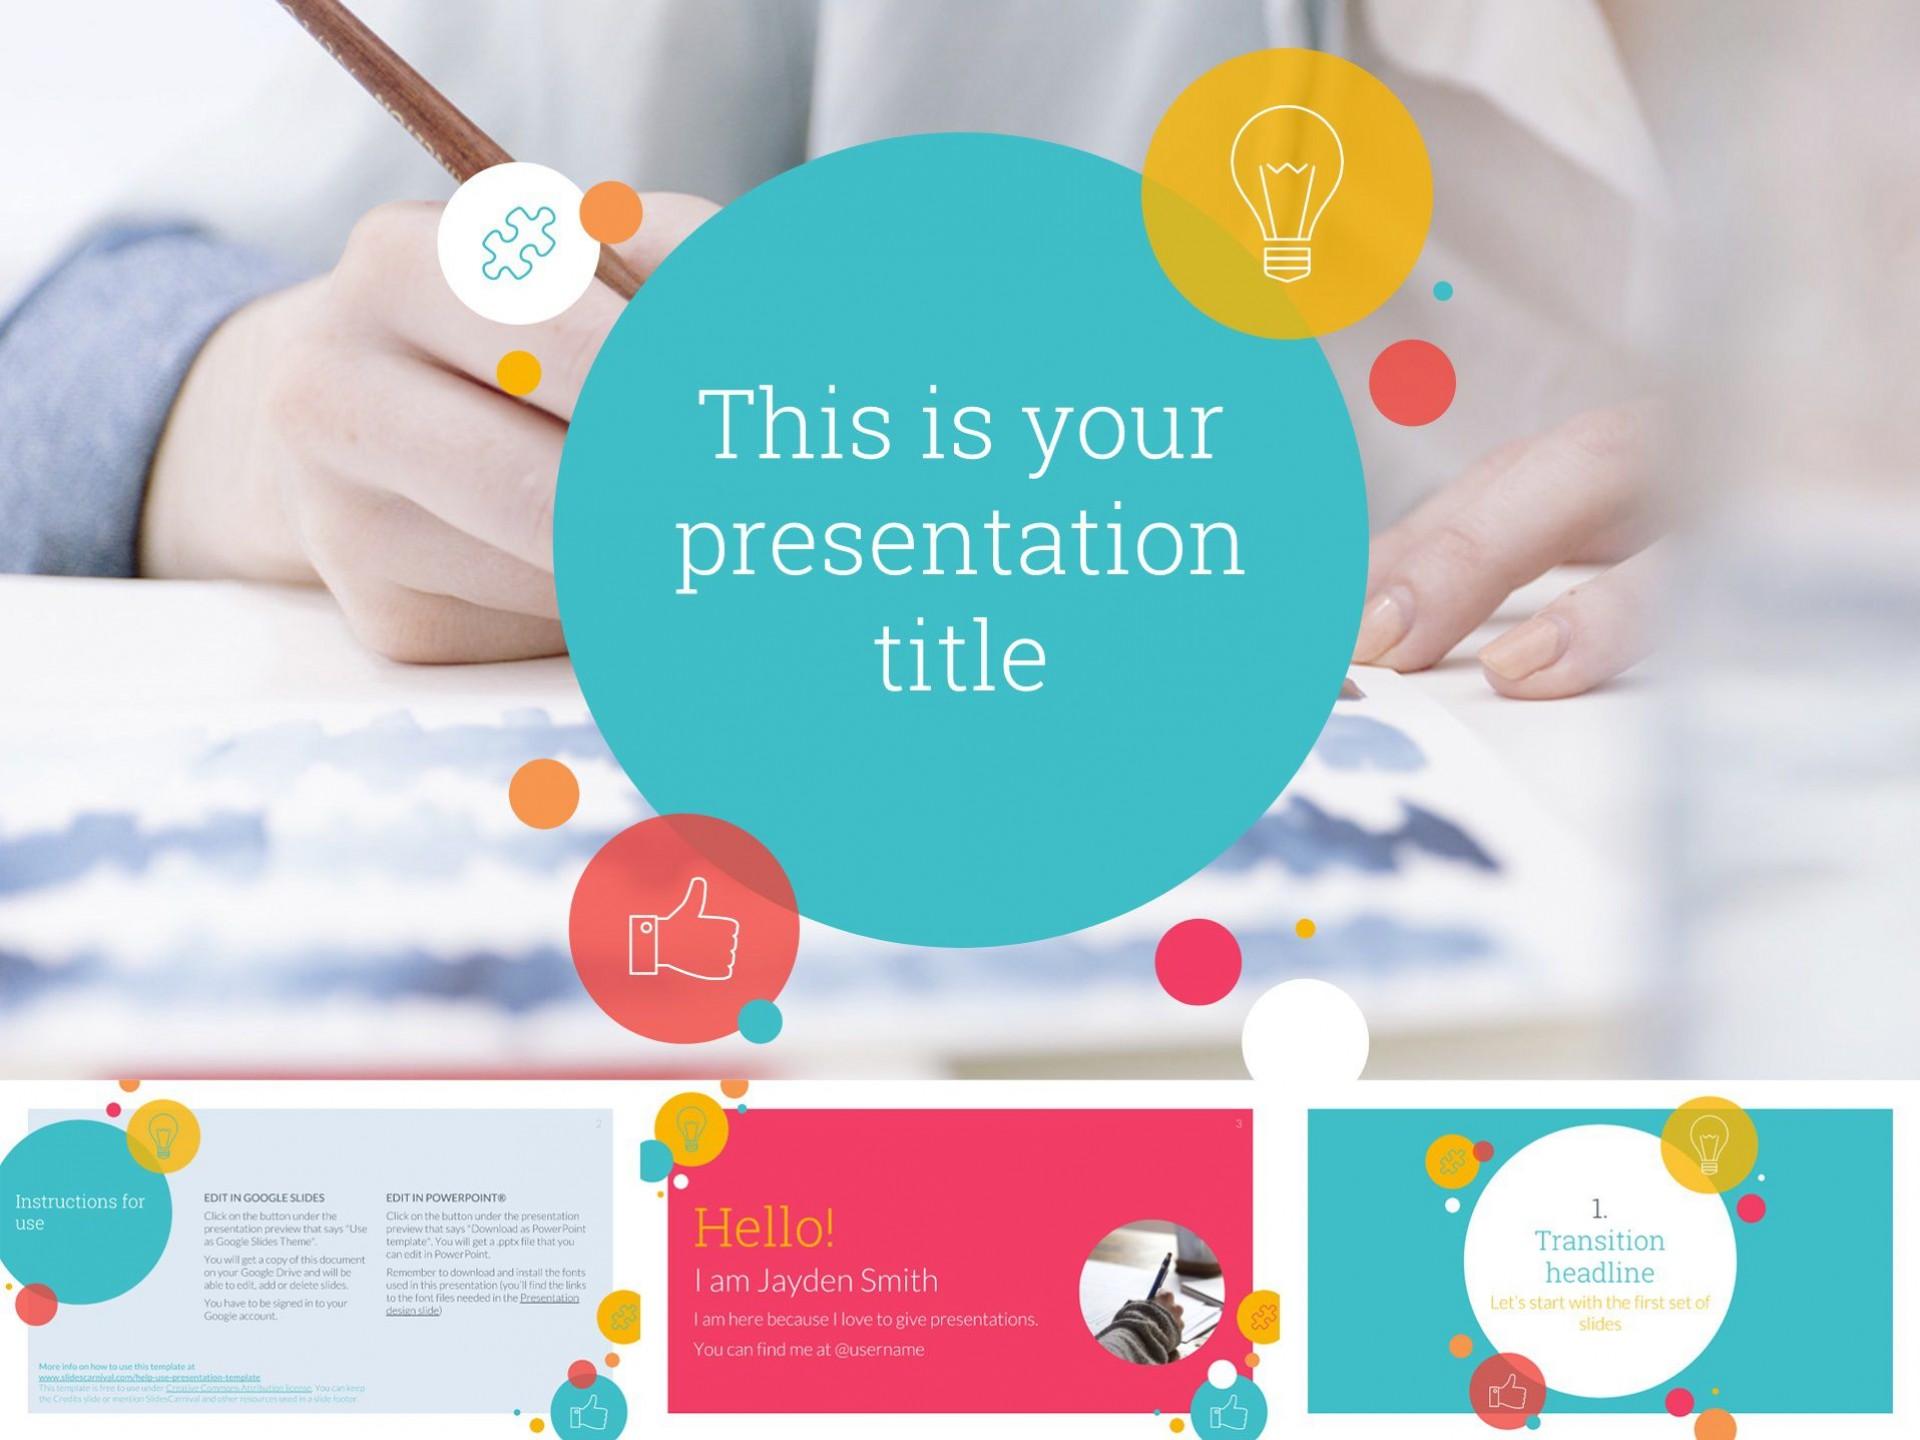 005 Imposing Google Doc Powerpoint Template Sample  Templates Presentation1920